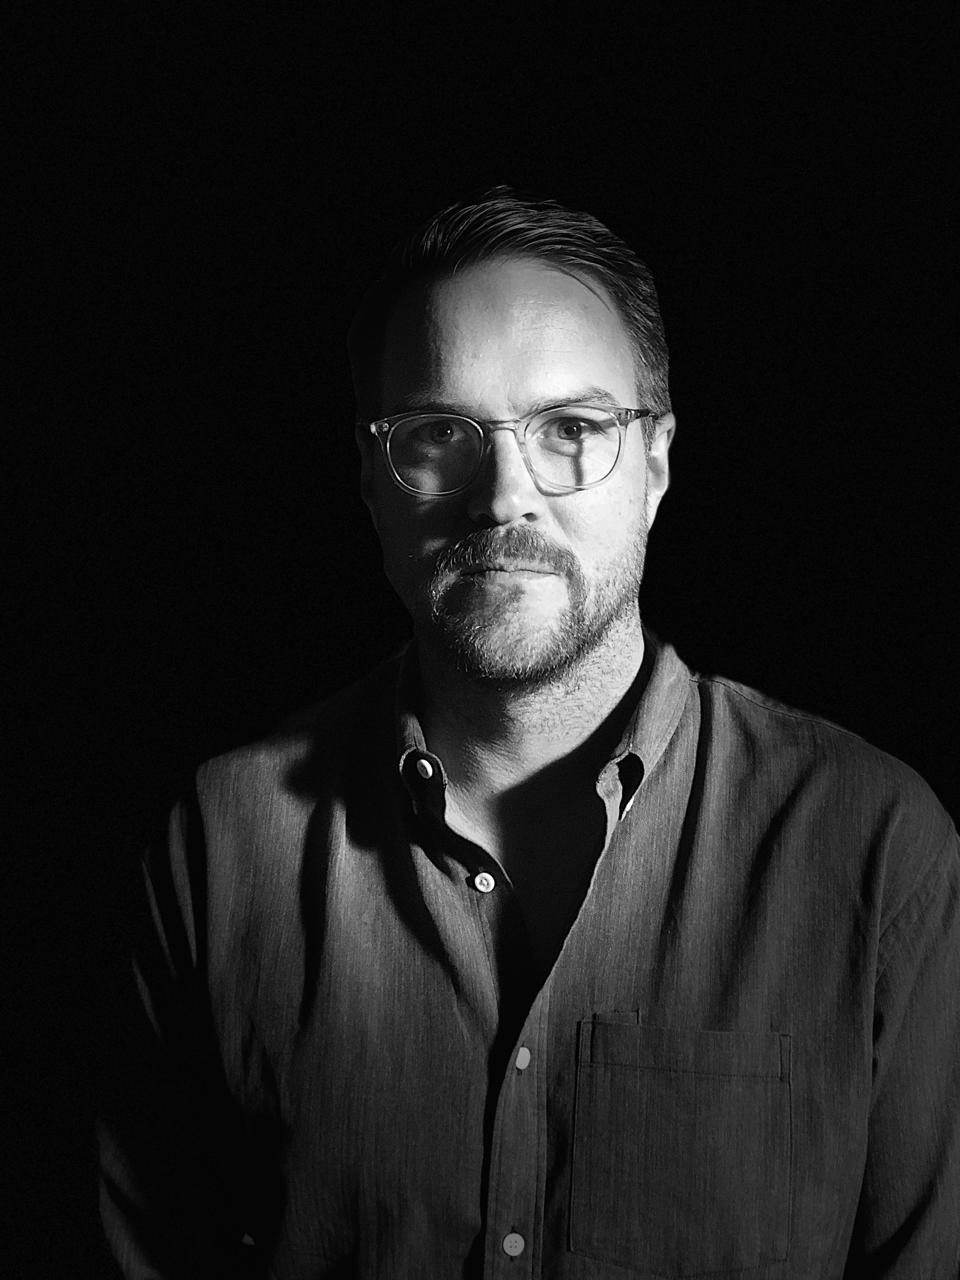 Director Patrick Brice